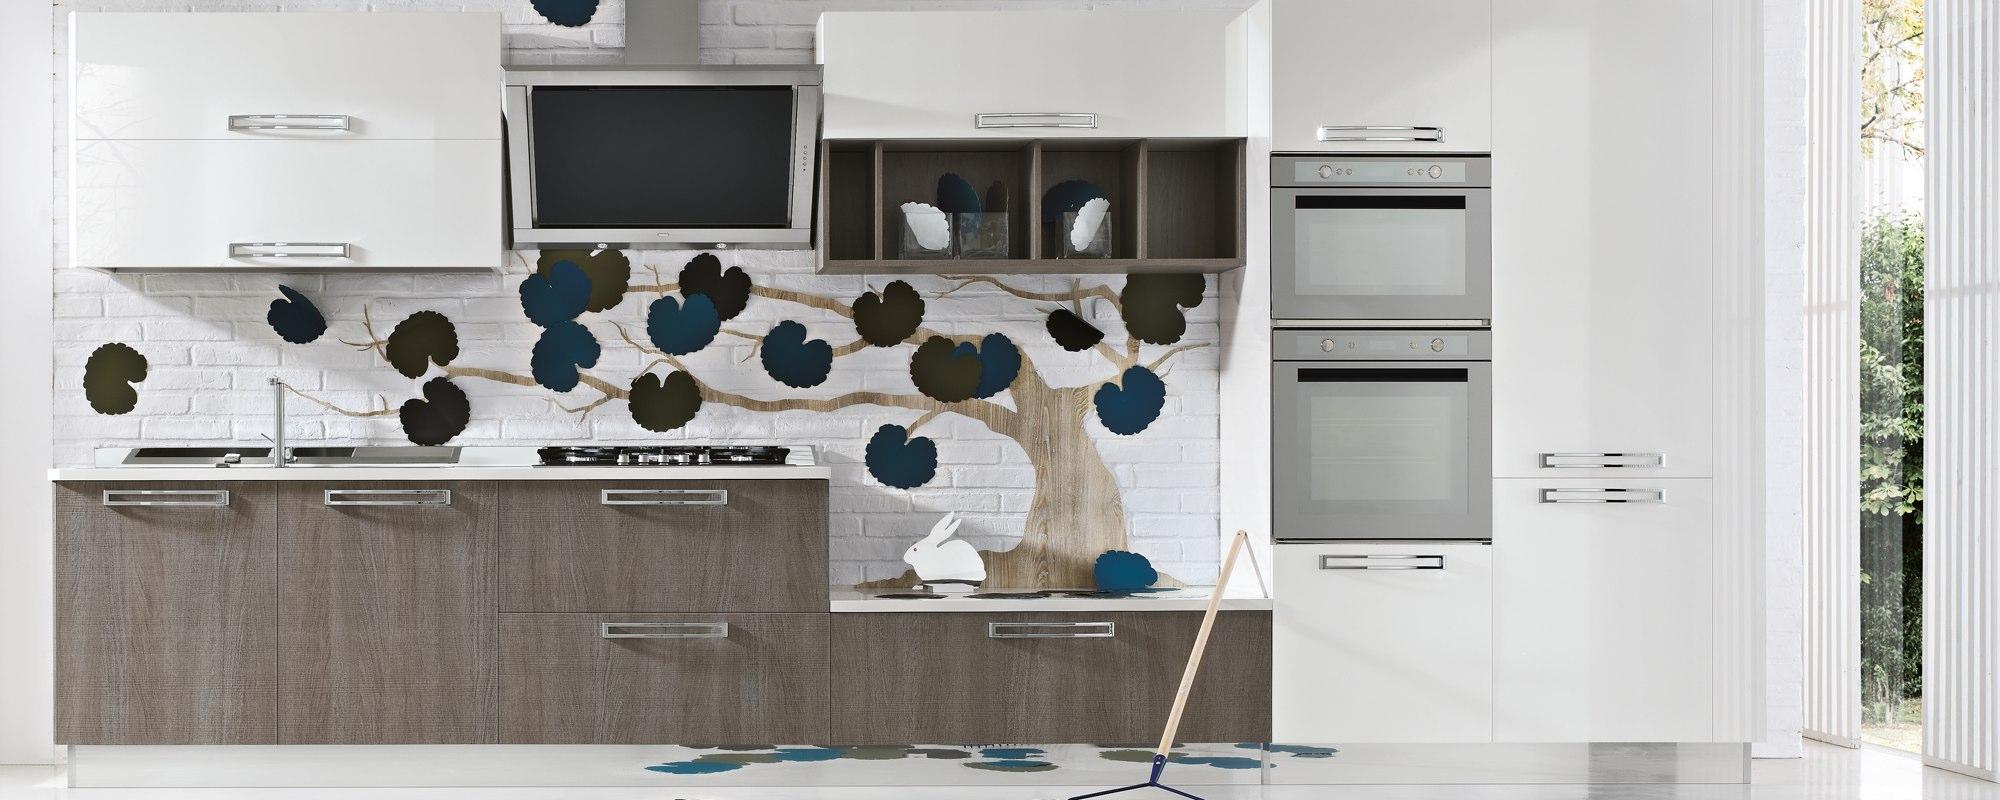 Cucine moderne a cagliari stosa milly design e - Cucine stosa milly ...